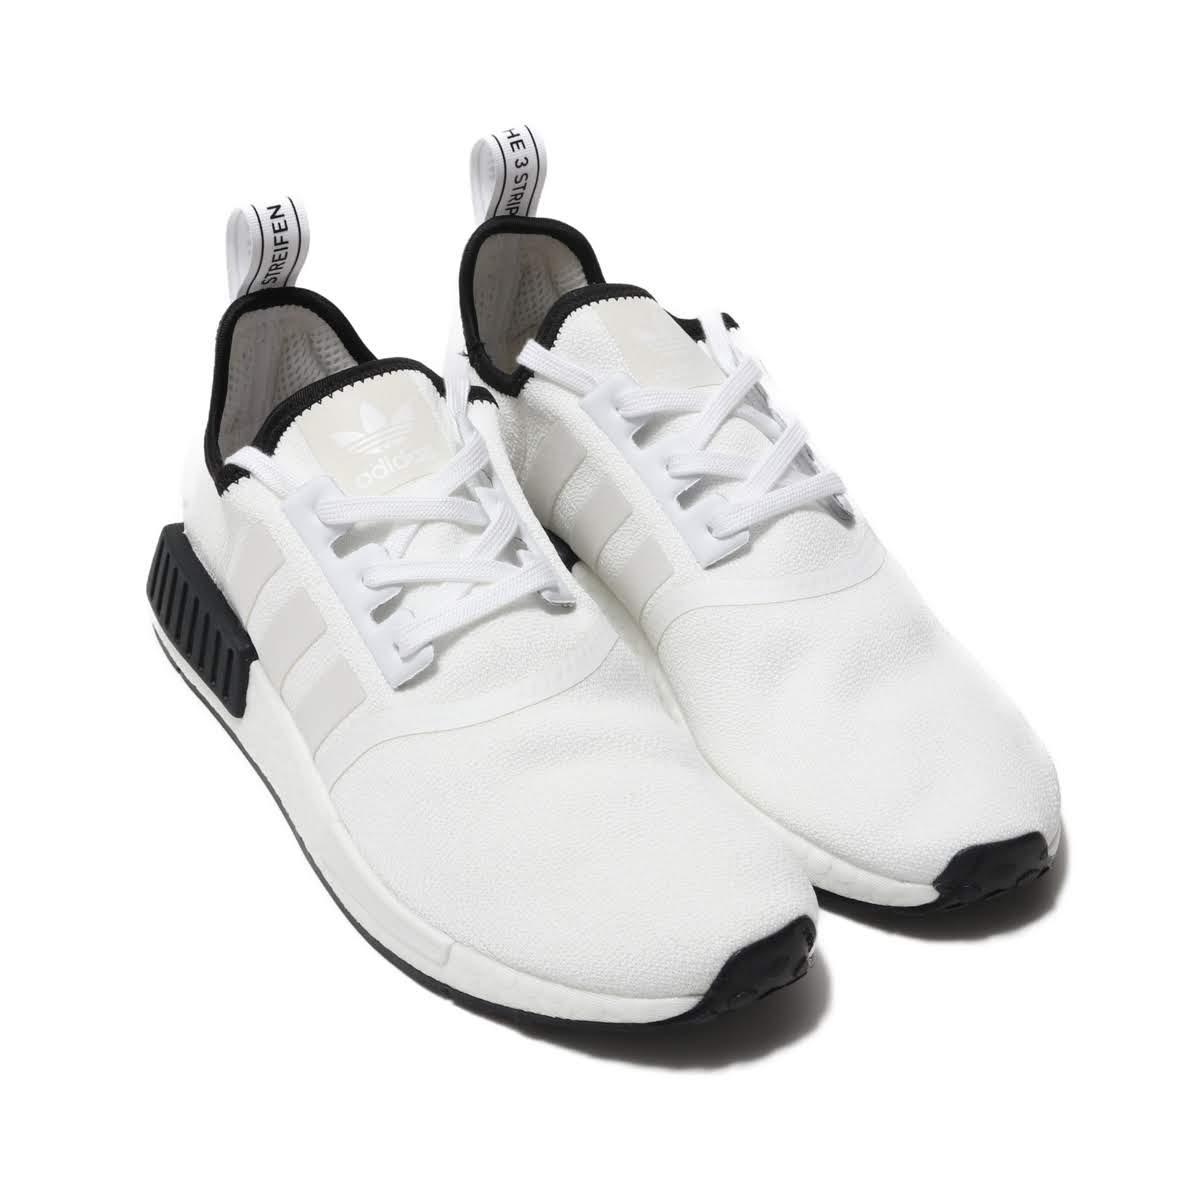 adidas Originals NMD_R1 (アディダスオリジナルス NMD_R1)FTWR WHITE/FTWR WHITE/CORE BLACK【メンズ レディース スニーカー】19SS-I